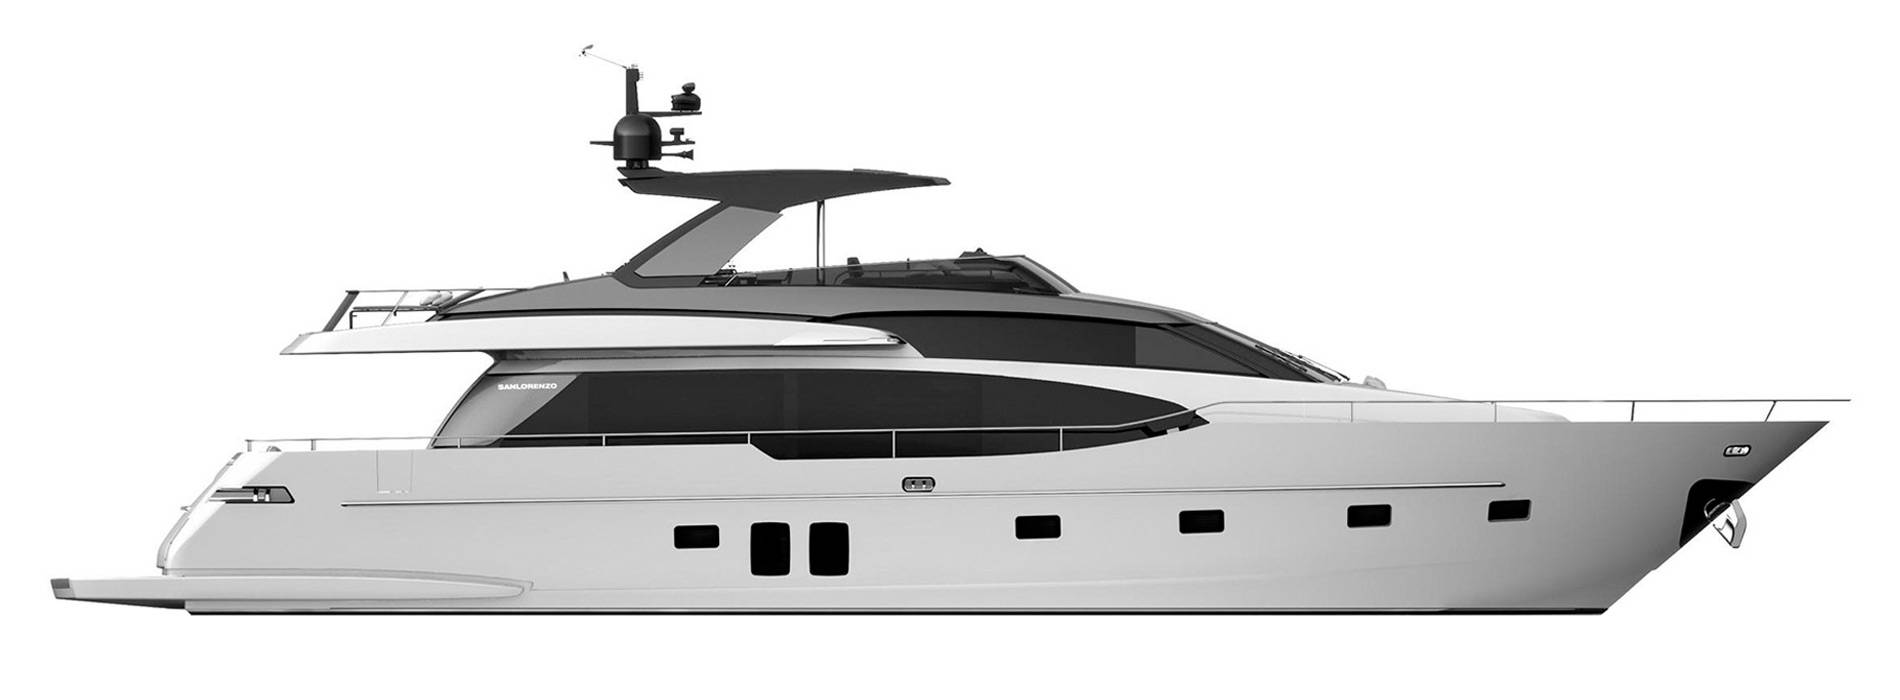 Sanlorenzo Yachts SL78 Profil